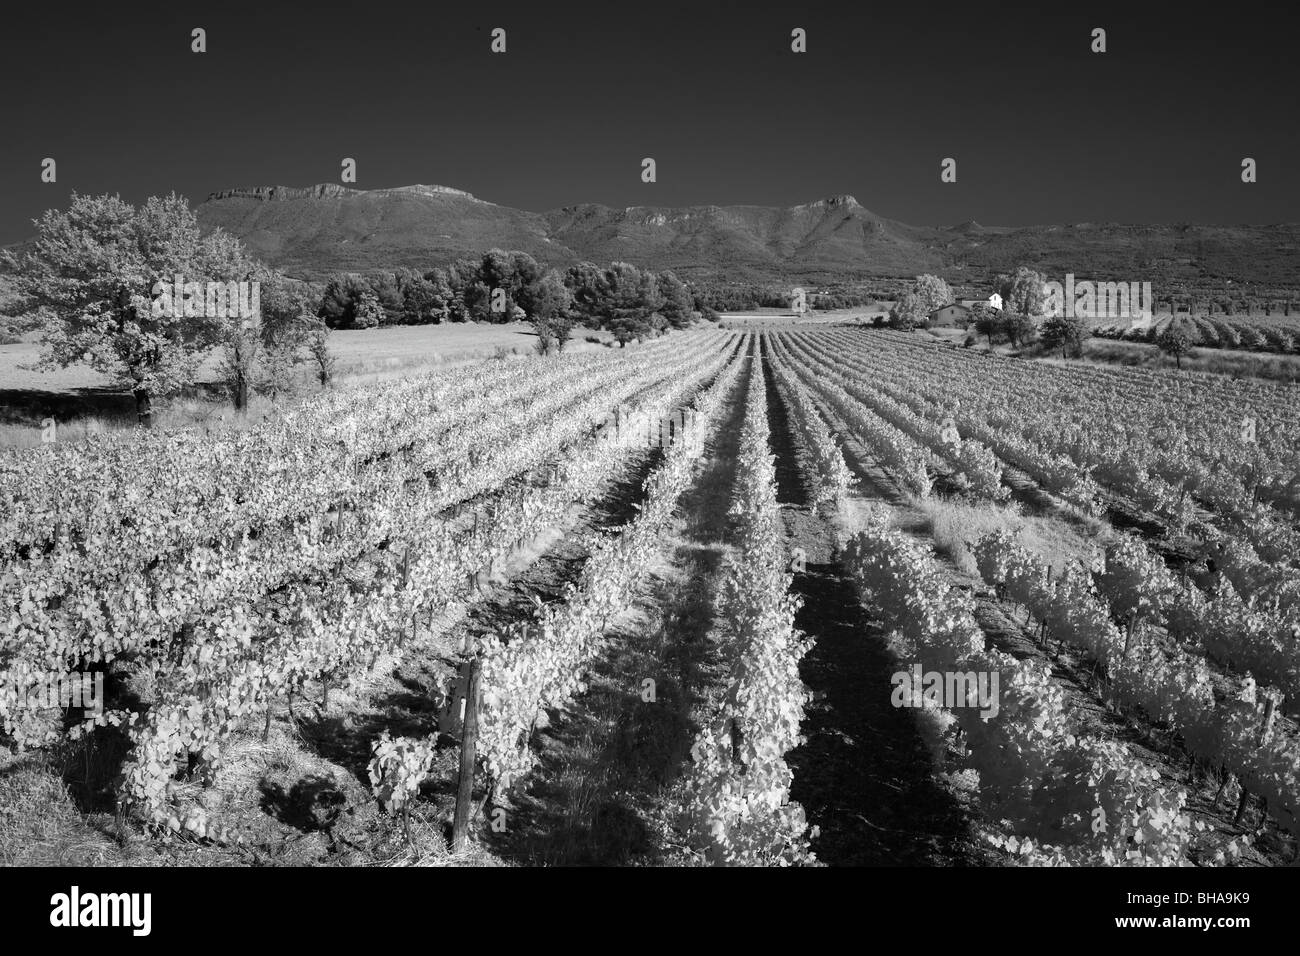 a vineyard nr Puyloubier, Bouches-du-Rhone, Provence, France - Stock Image